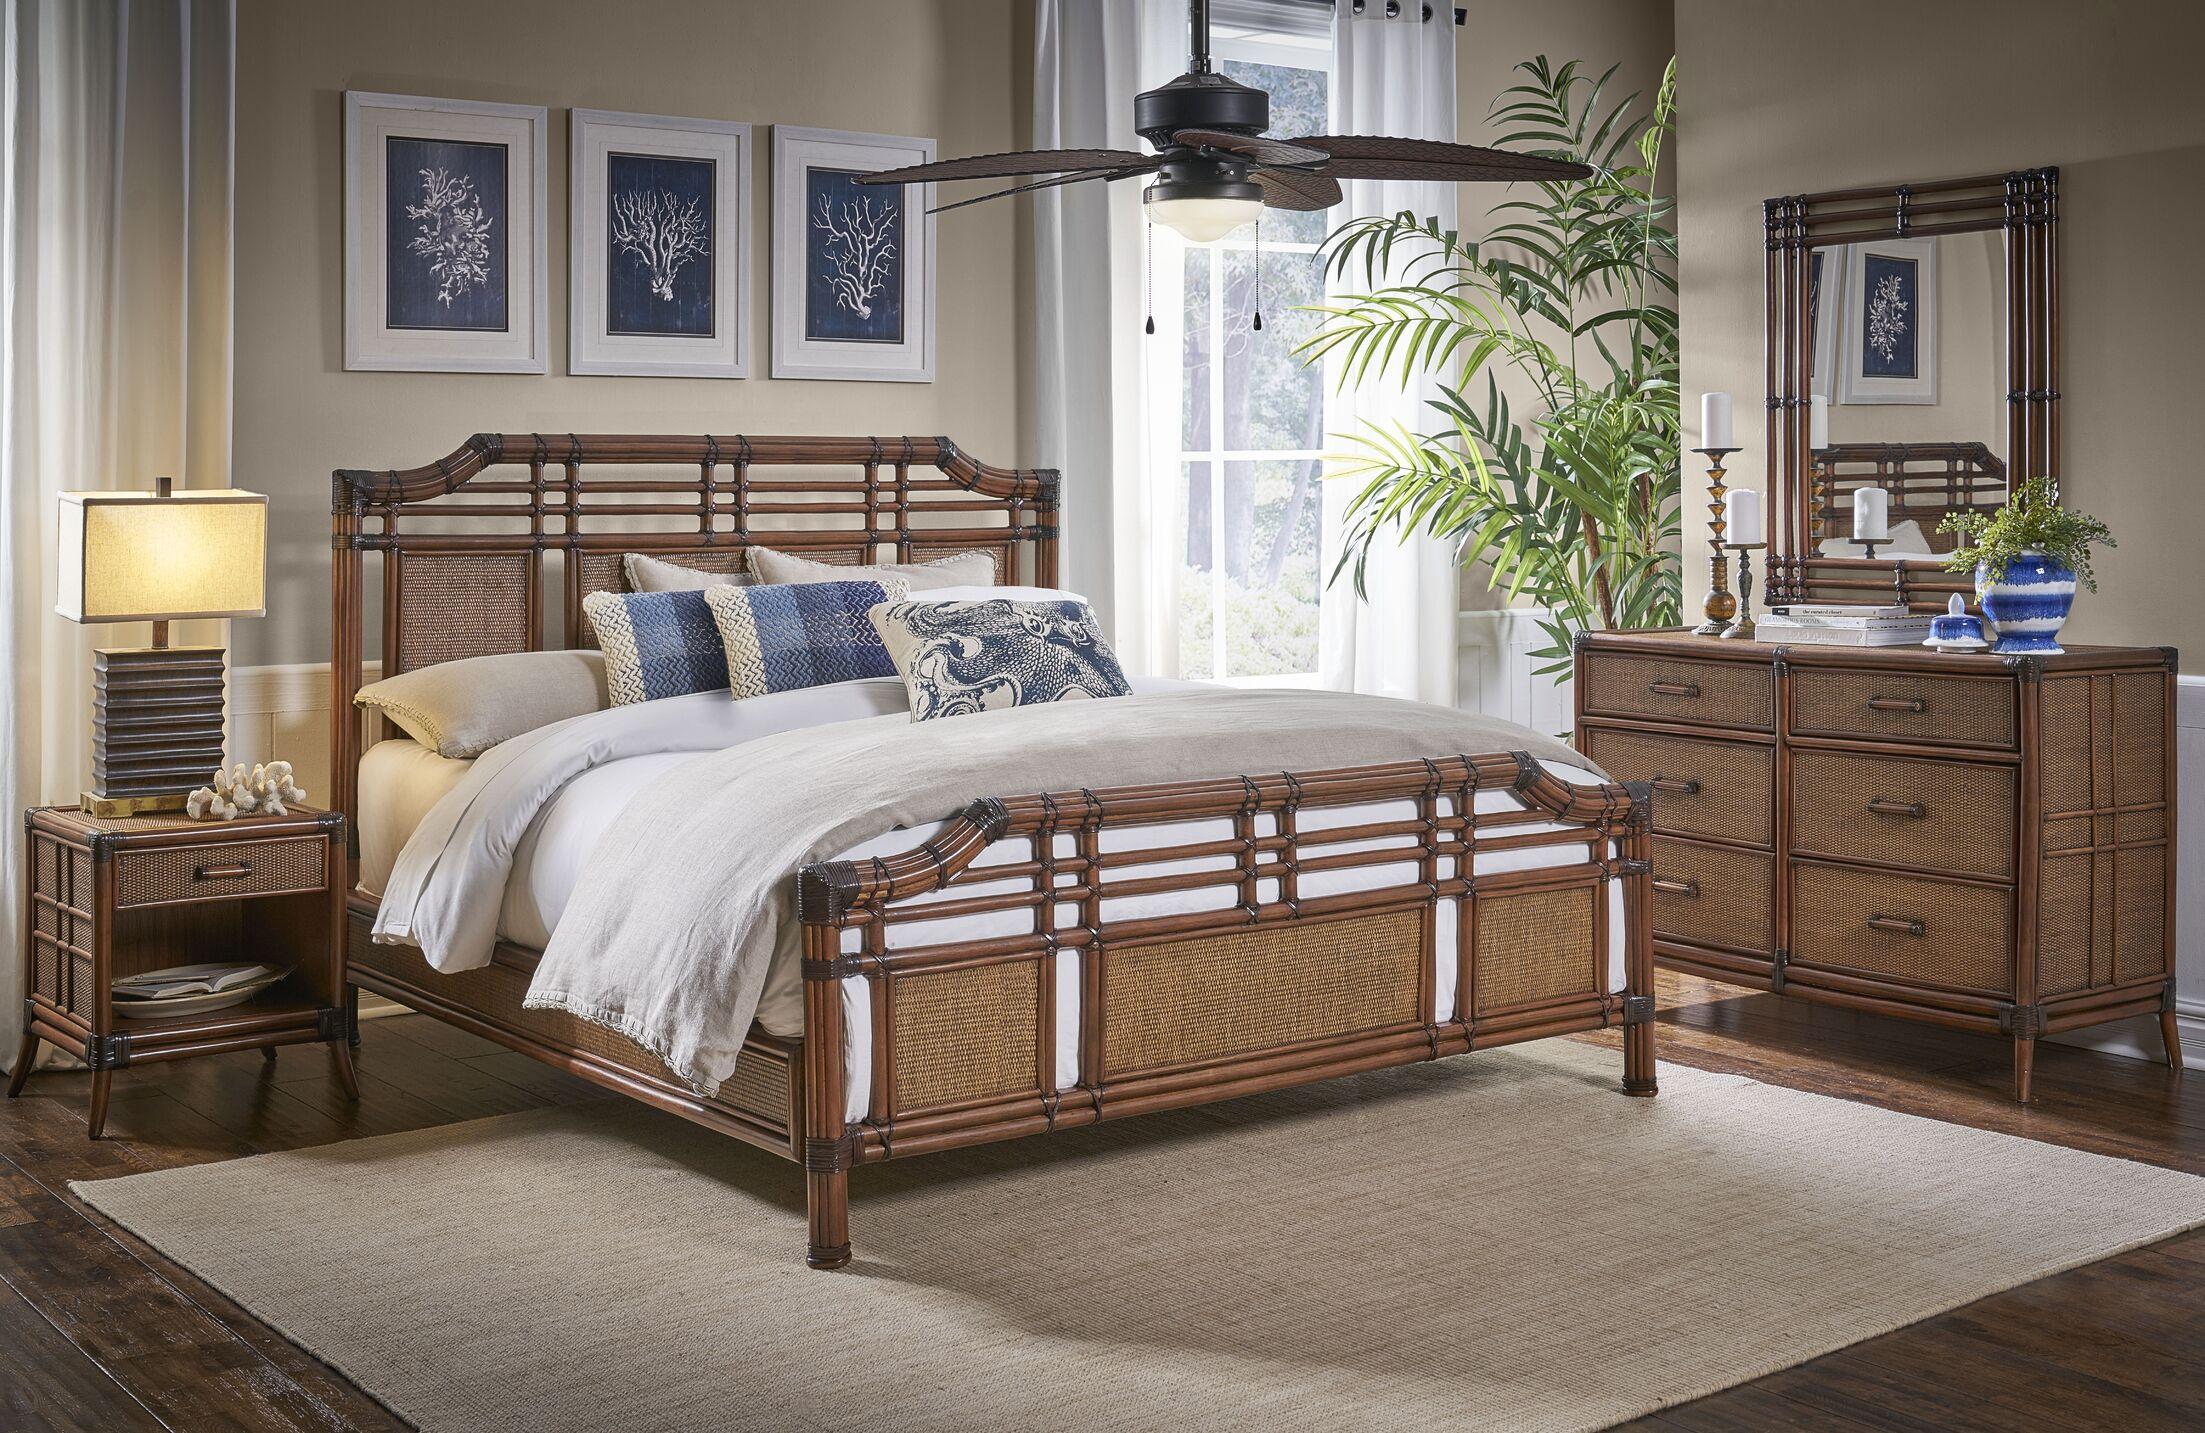 Ashleigh Complete Panel Bedroom Set Size: Queen